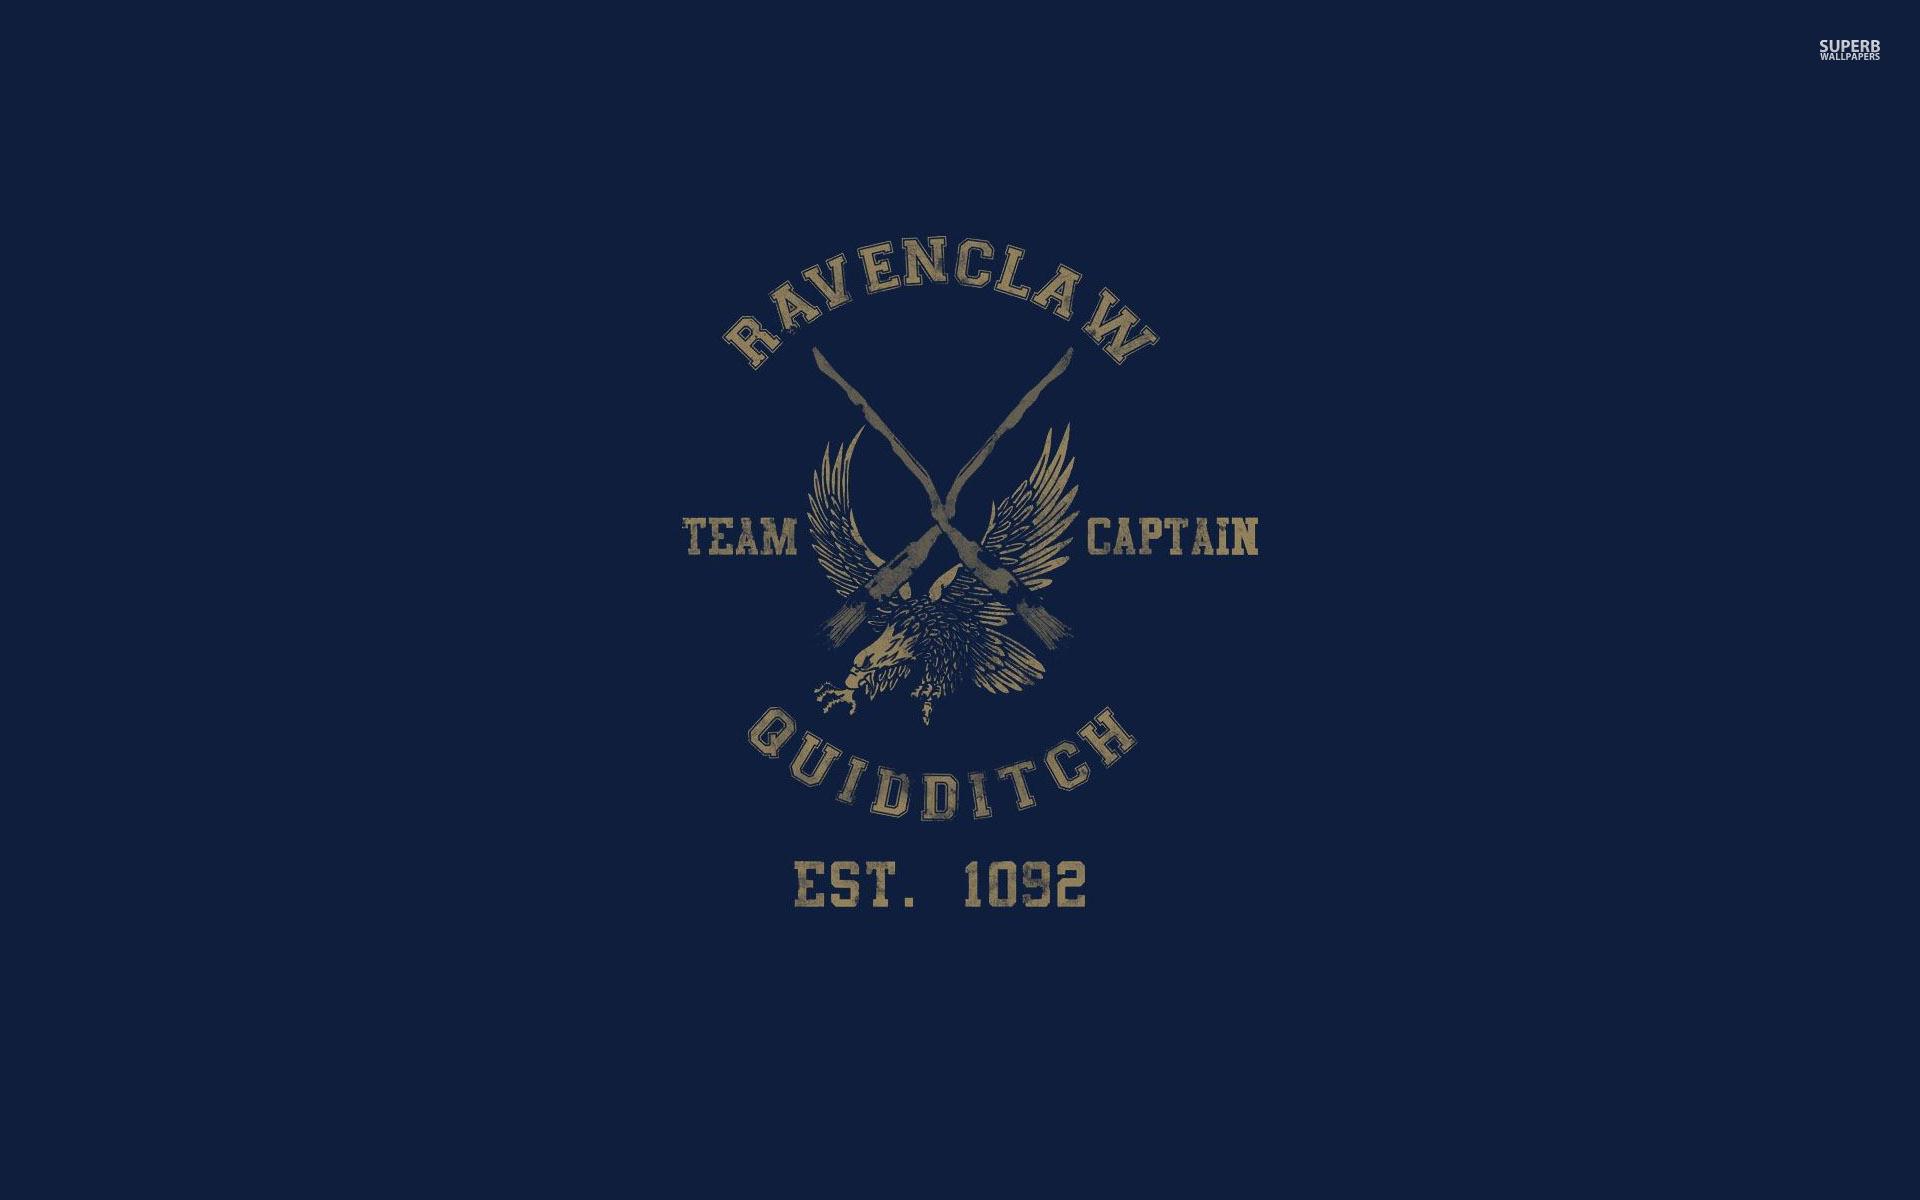 ravenclaw wallpaper hd stay031 | staywallpaper